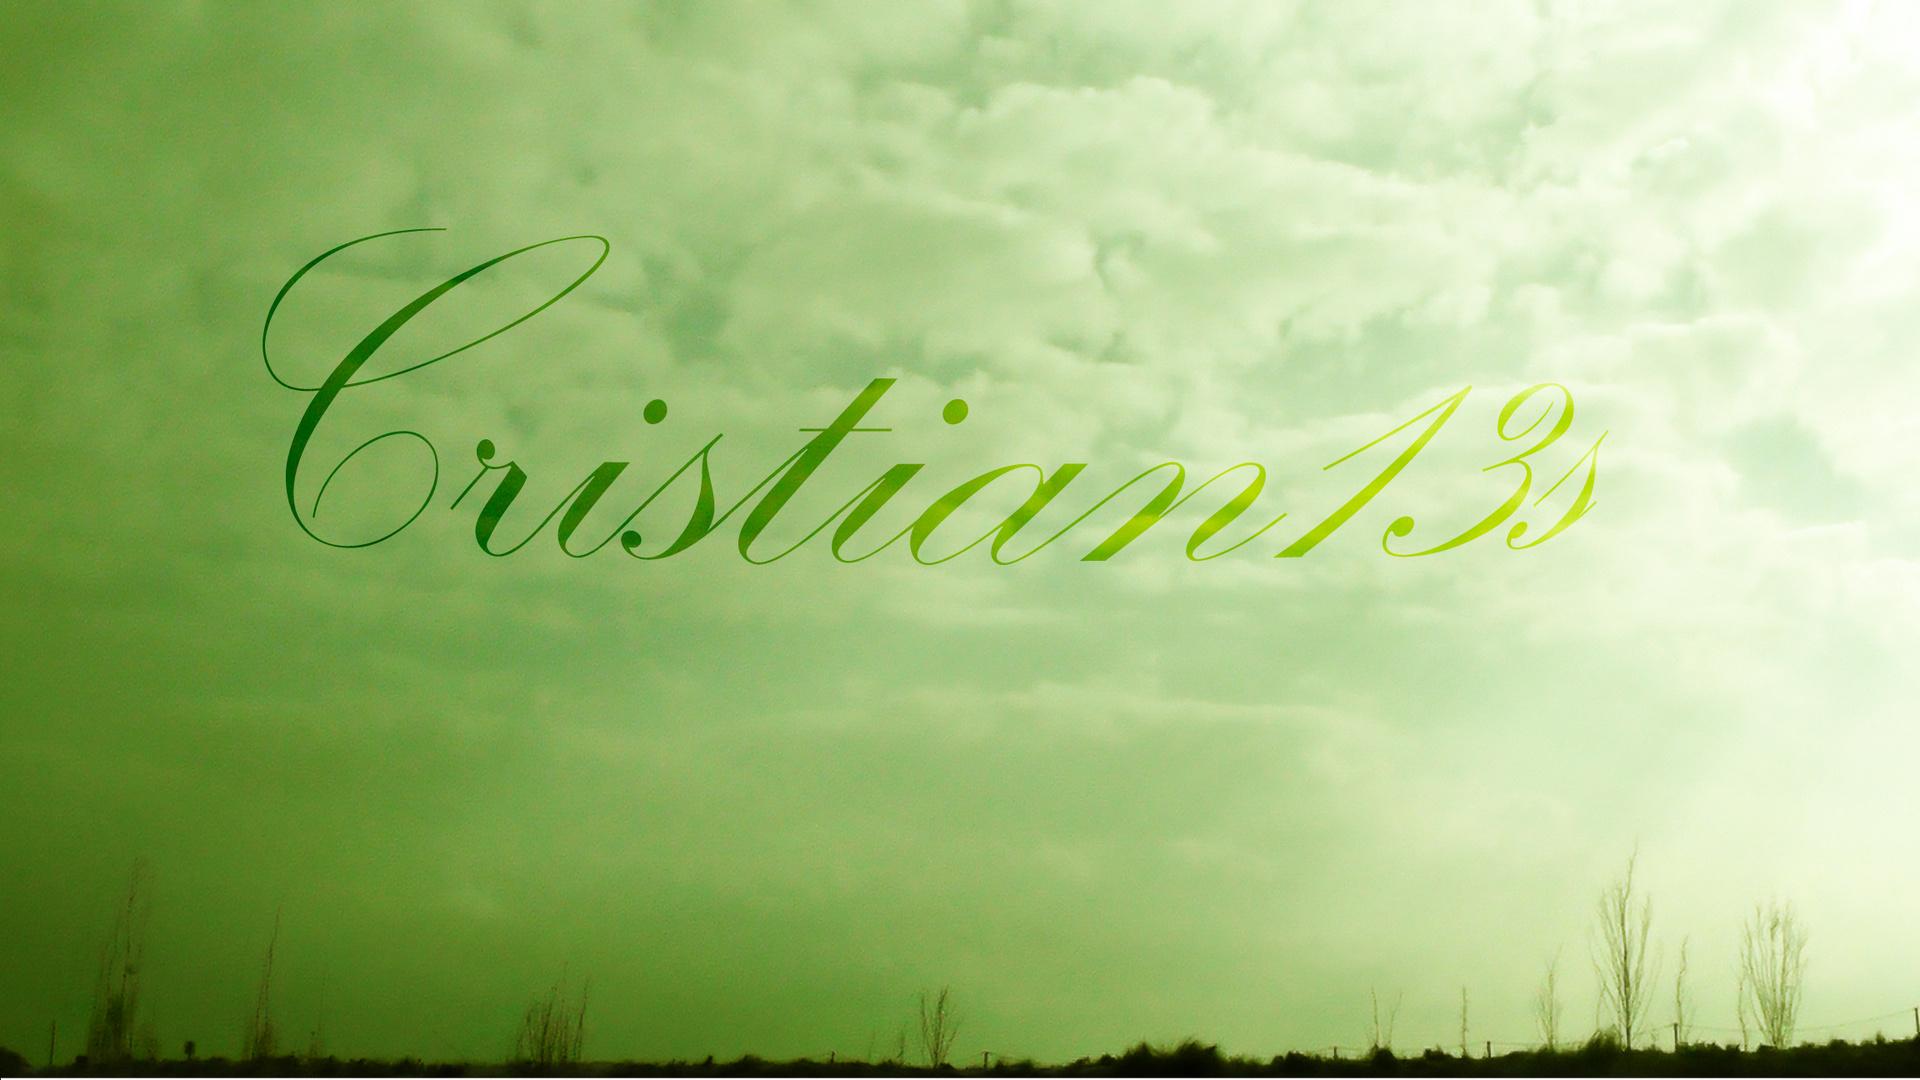 Cristian13s ;D